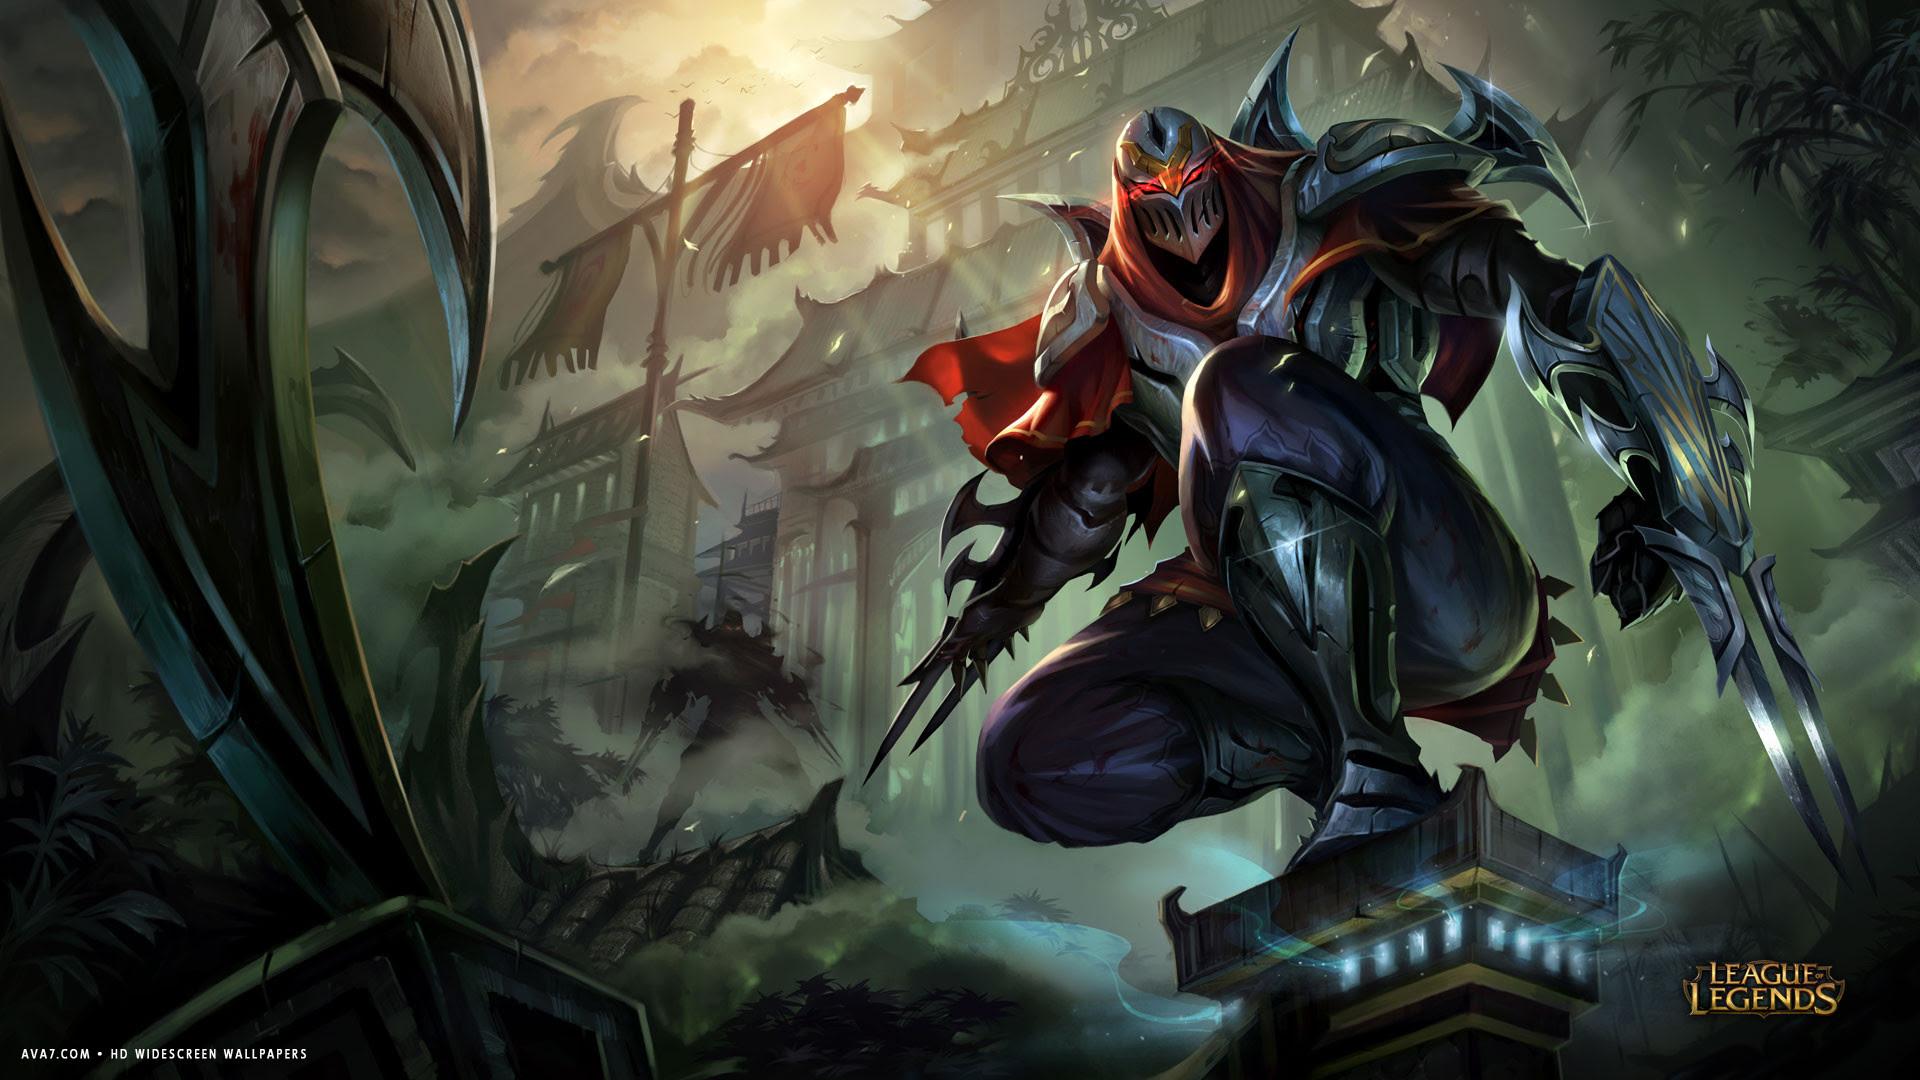 League Of Legends Game Lol Zed Warrior Hd Widescreen Wallpaper